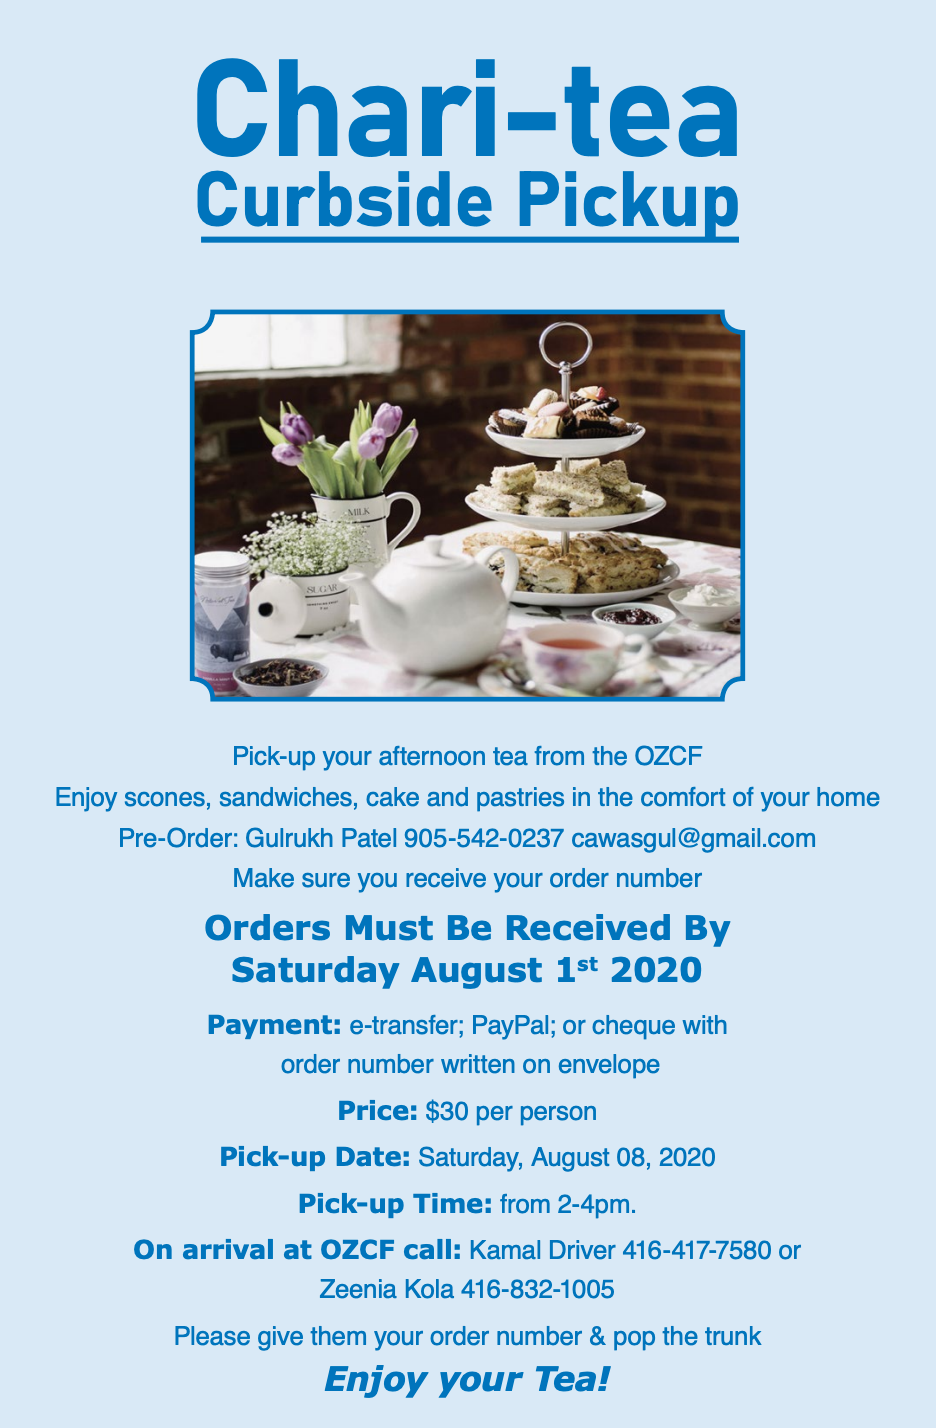 chari-tea fundraiser from the zoroastrian foundation